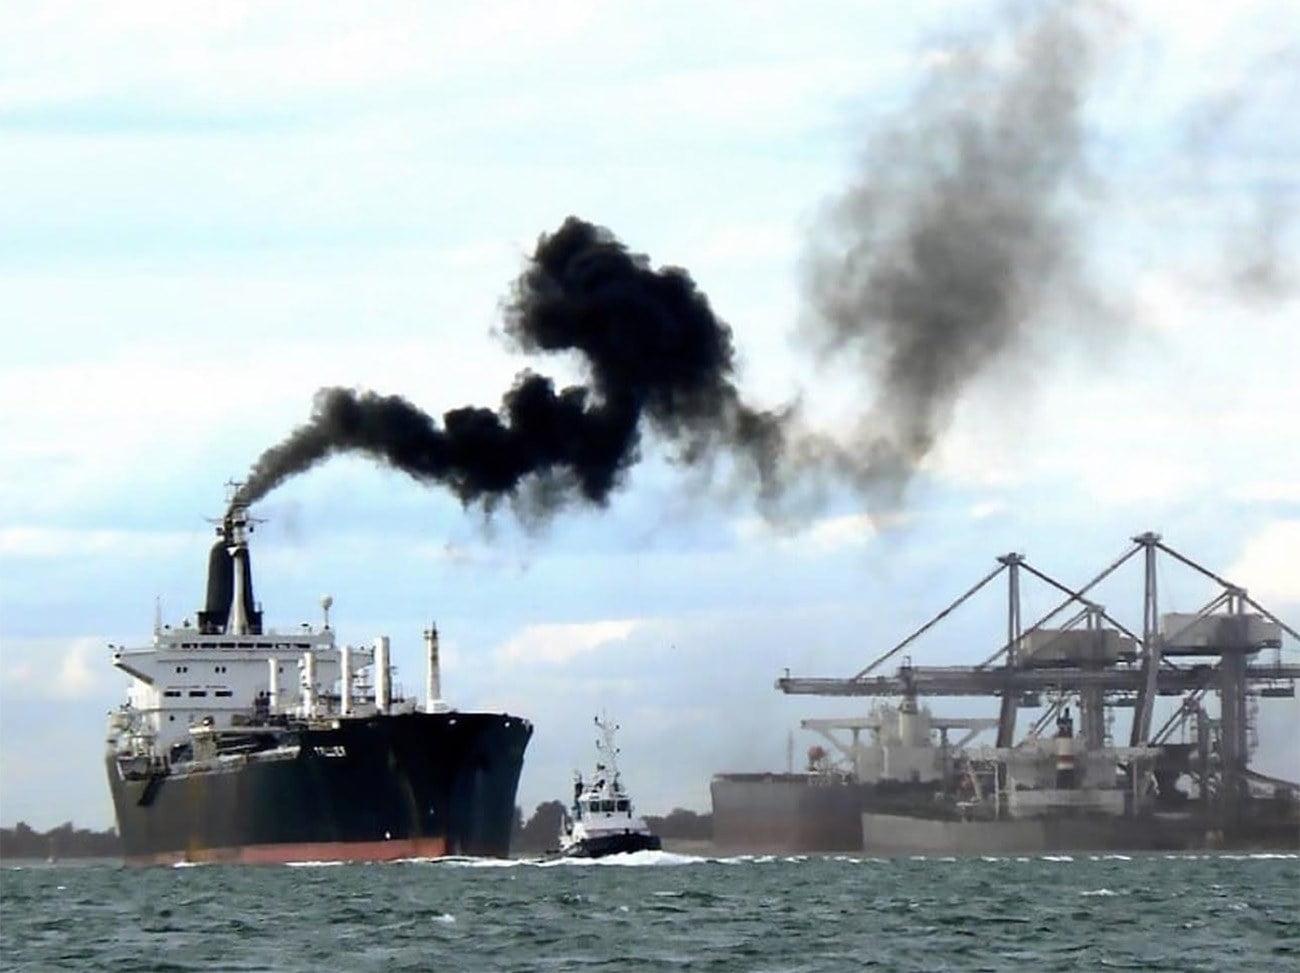 Image de navio emitindo fumaça preta